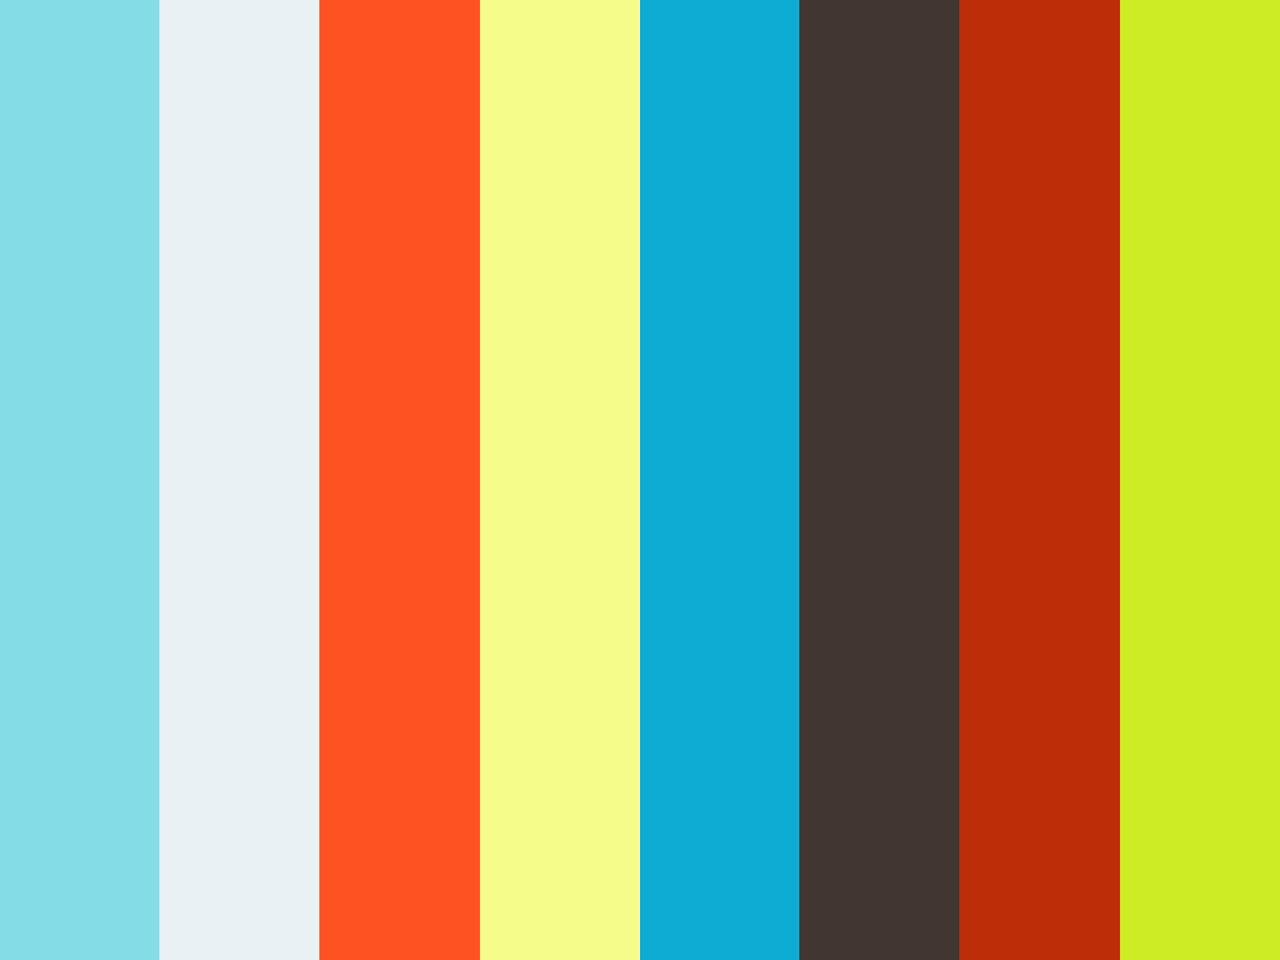 EIE CUT 2013 Promo VIMEO 720p